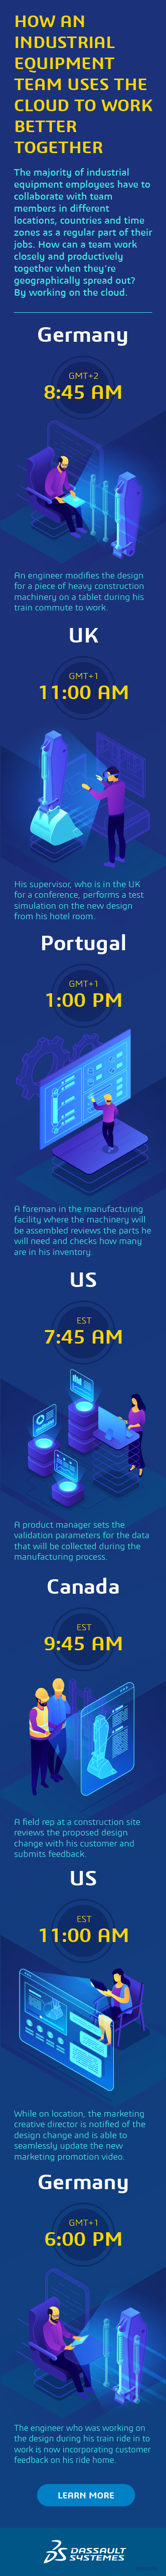 Cloud Collaboration for Manufacturers > Industrial Equipment Teamwork > Dassault Systèmes®